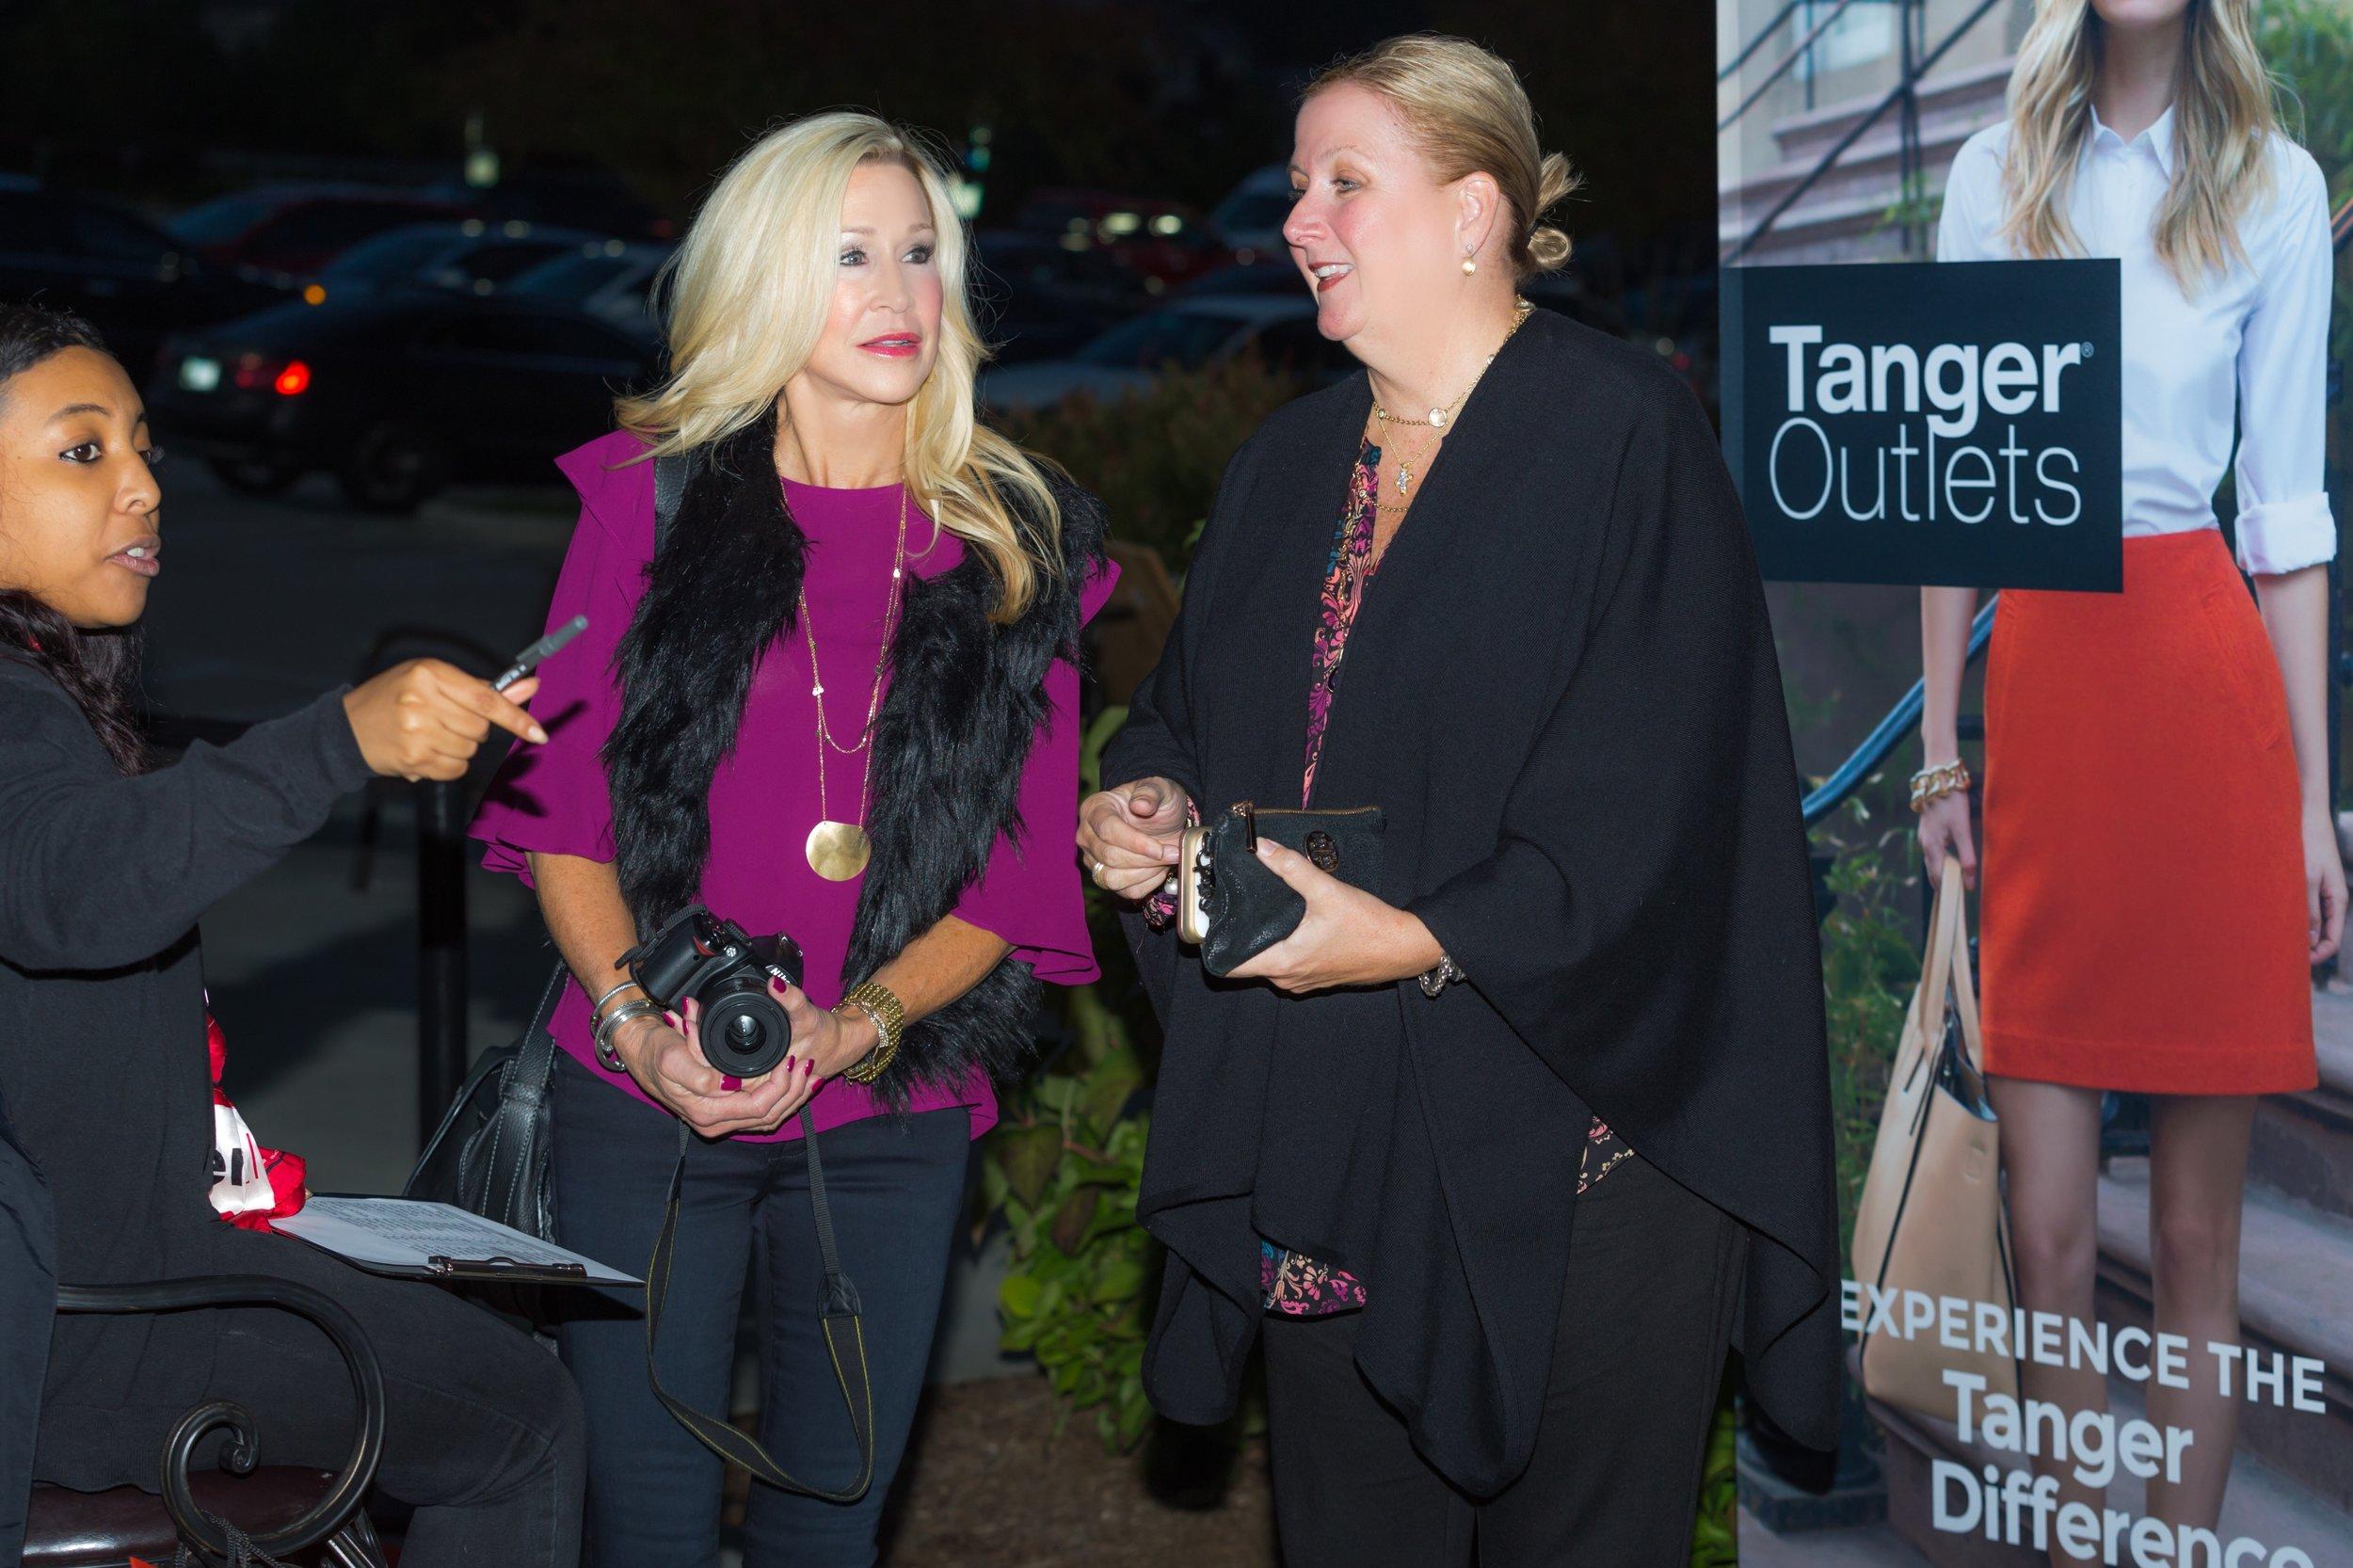 Tanger Outlet Blogger Event